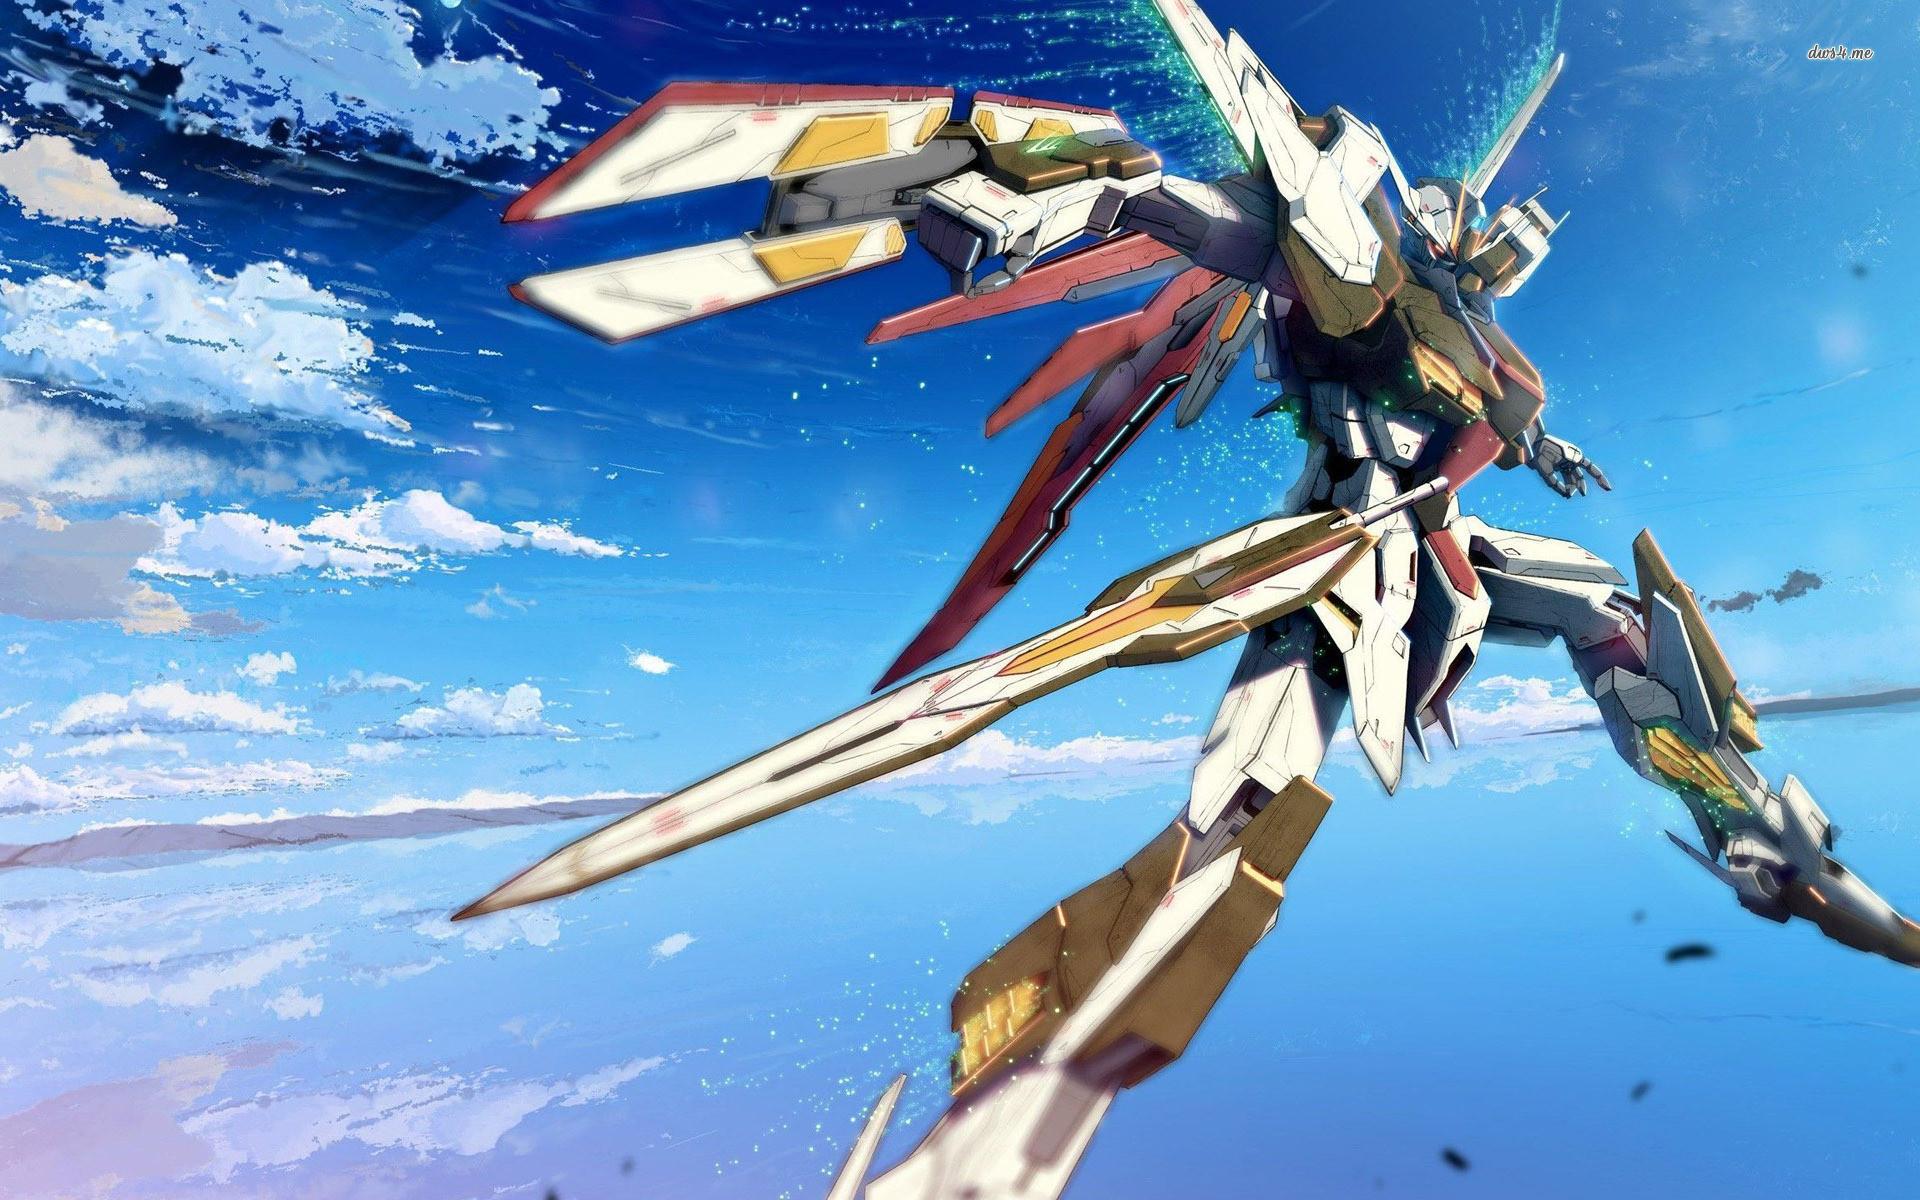 Image GN Gundam Exia Sky The Gundam Wiki | HD Wallpapers | Pinterest |  Gundam, Hd wallpaper and Wallpaper